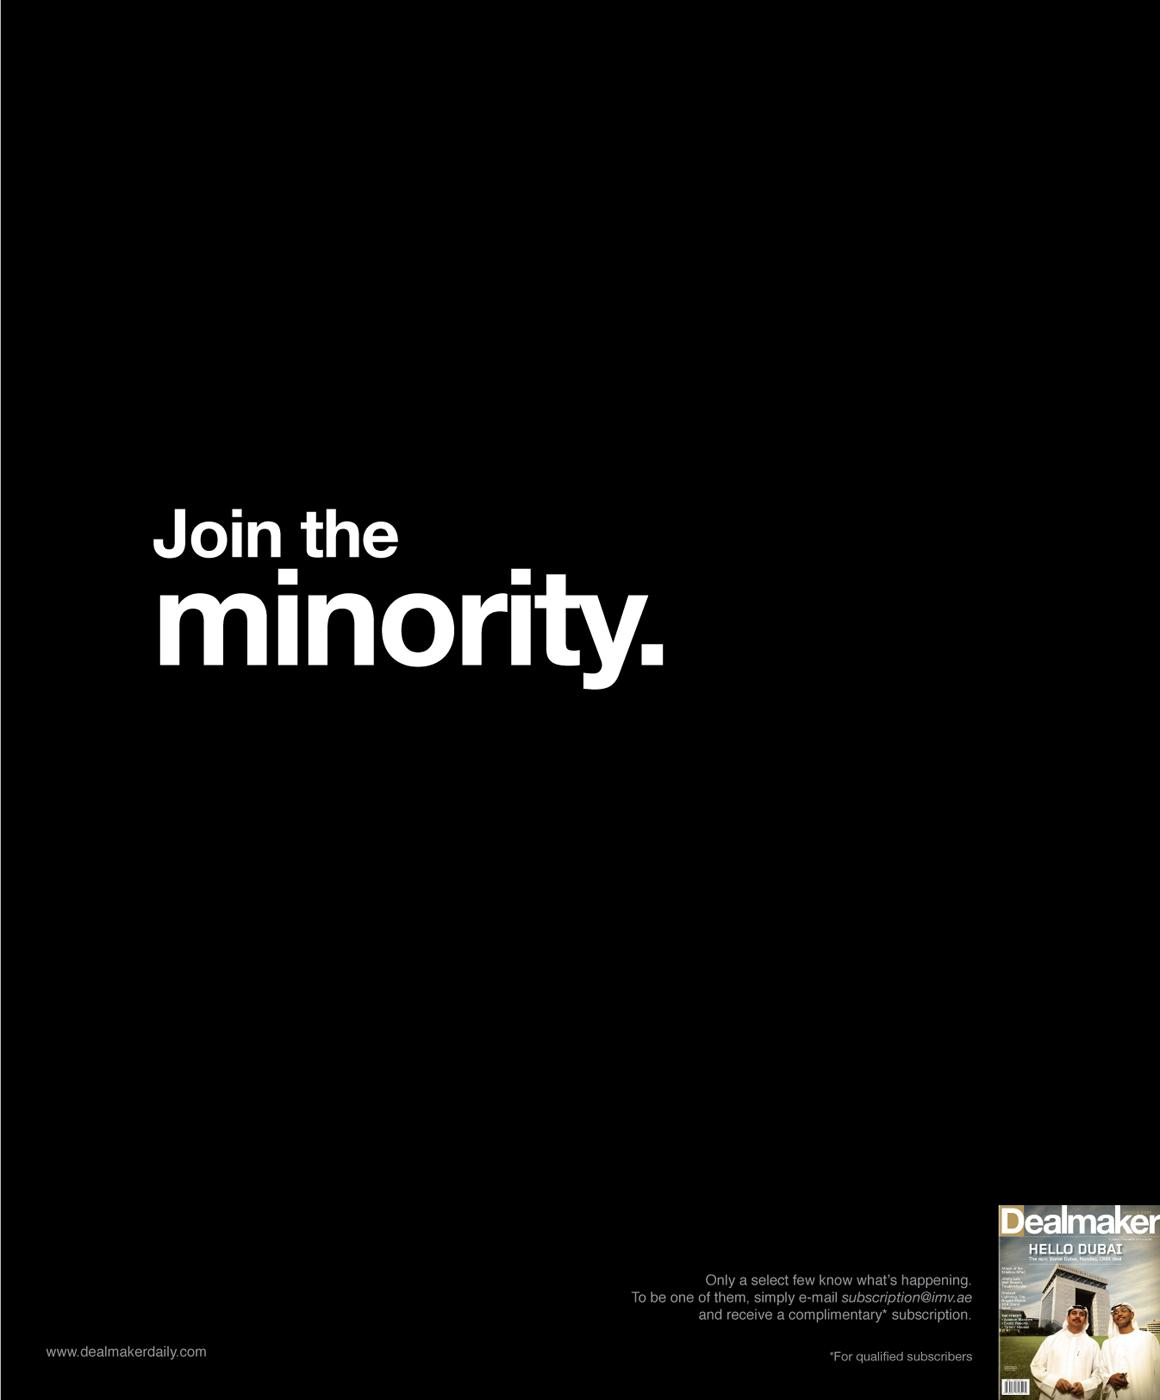 Dealmaker Print Ad -  Minority